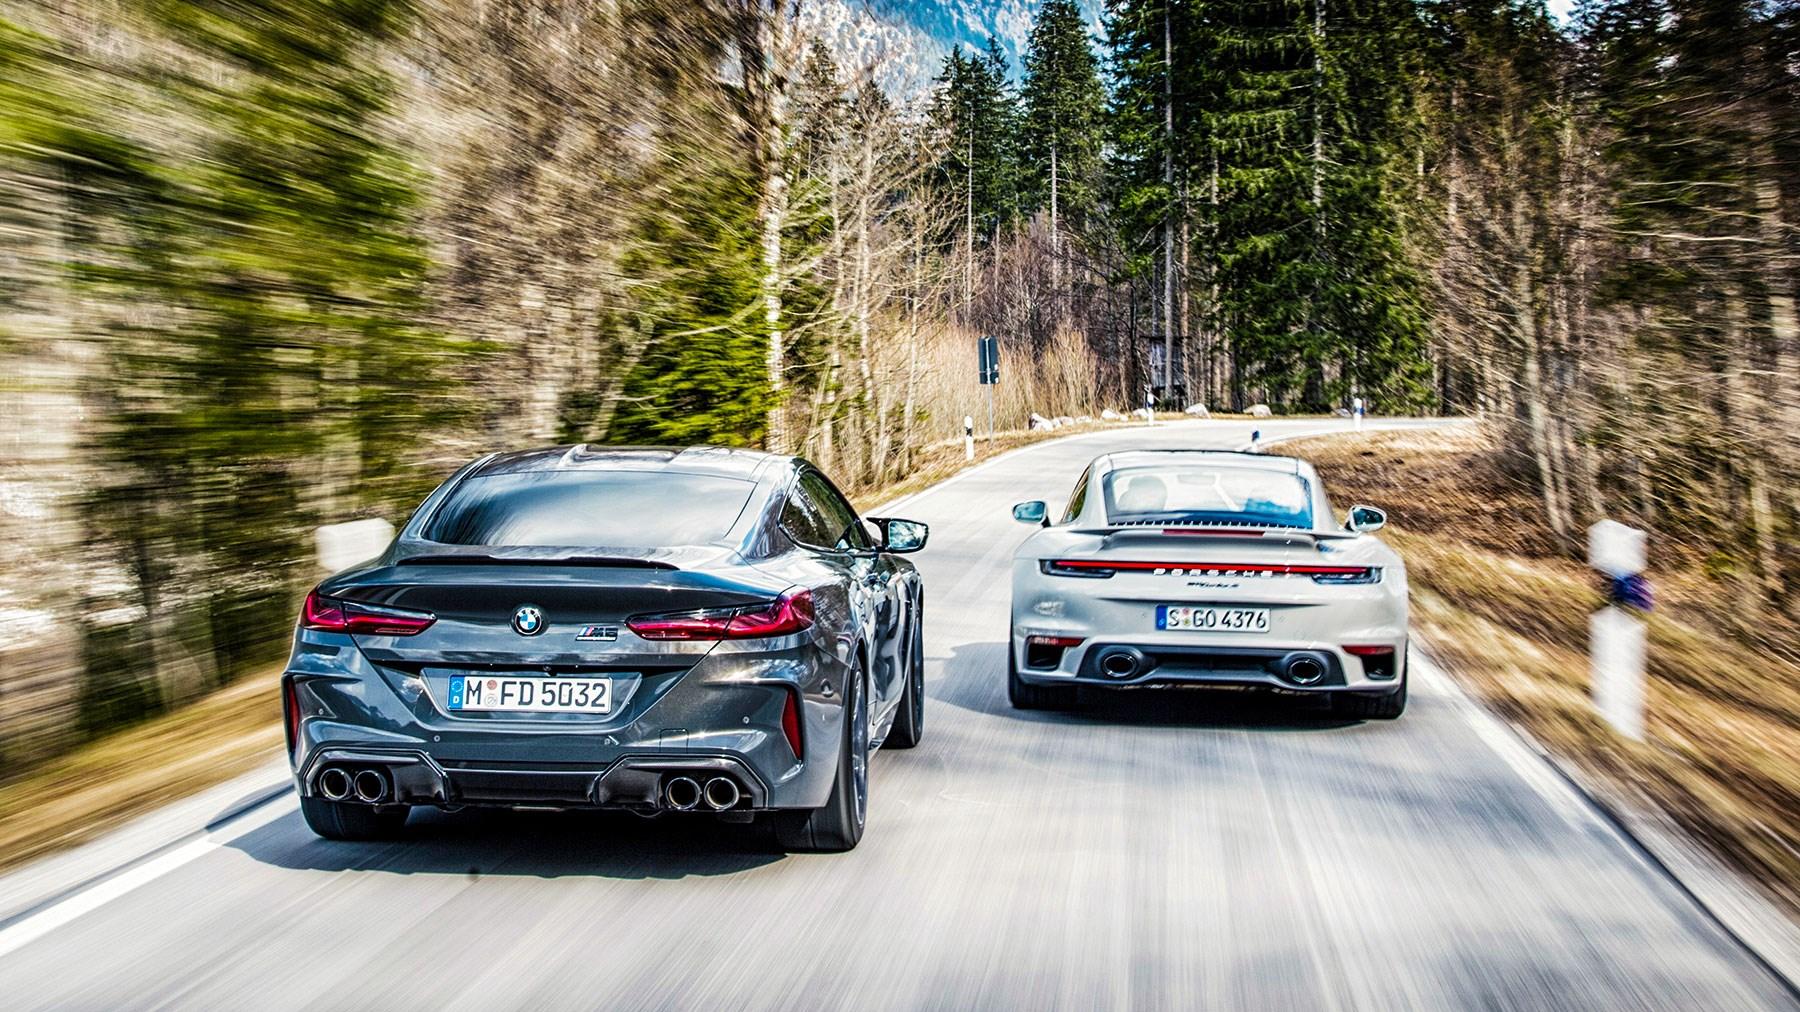 Porsche 911 Turbo S Vs Bmw M8 Competition Twin Test Car Magazine